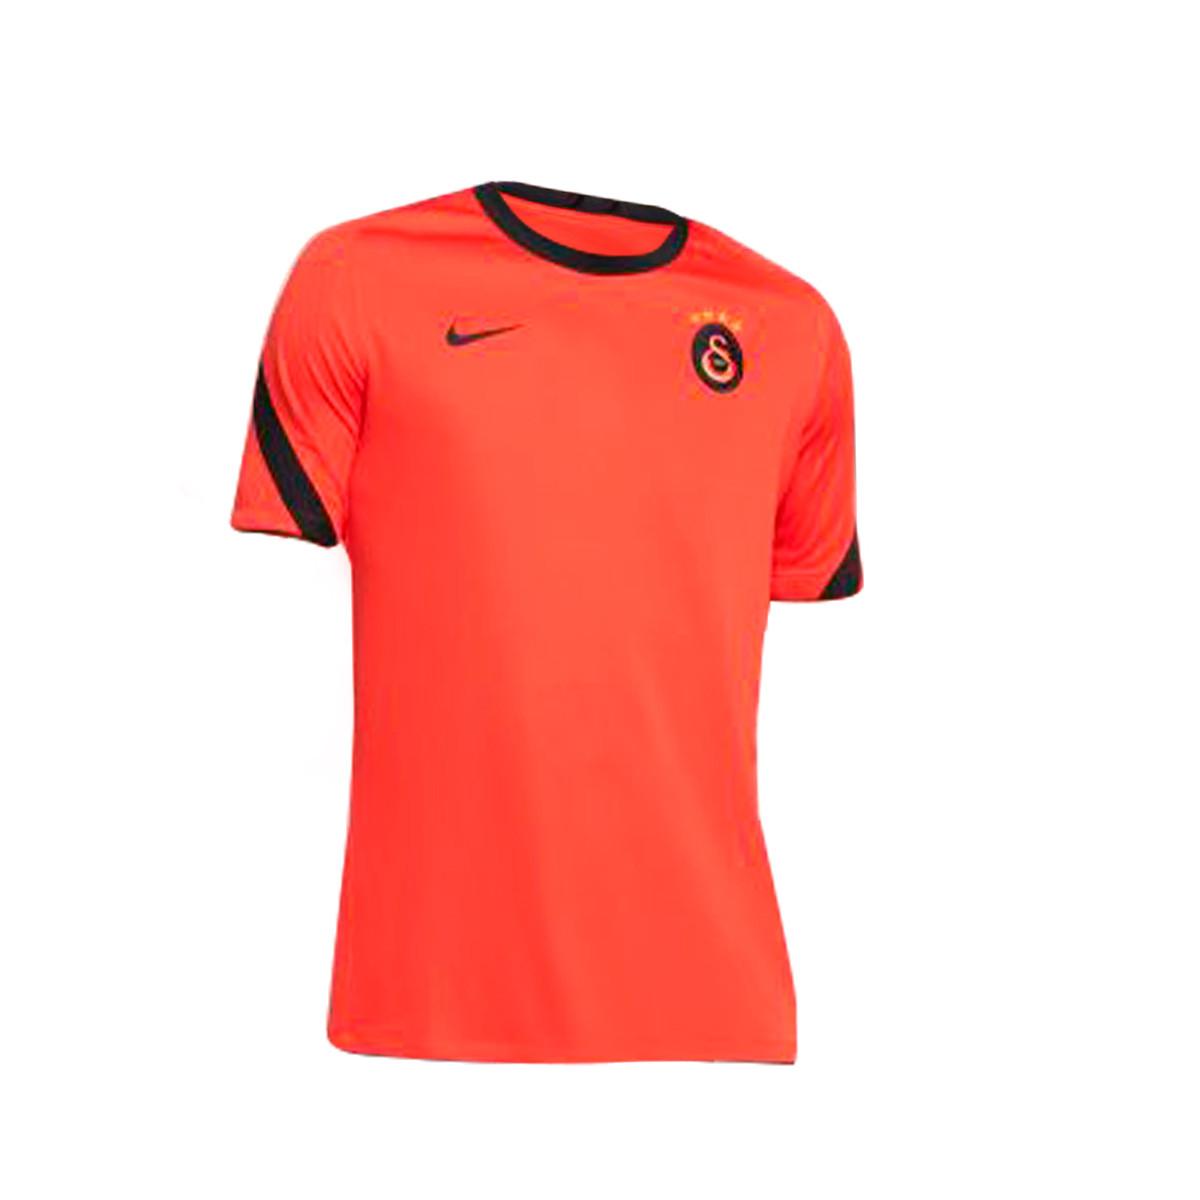 élite Prominente Te mejorarás  Jersey Nike Galatasaray SK Strike Top CL 2020-2021 Chile red-Black -  Football store Fútbol Emotion